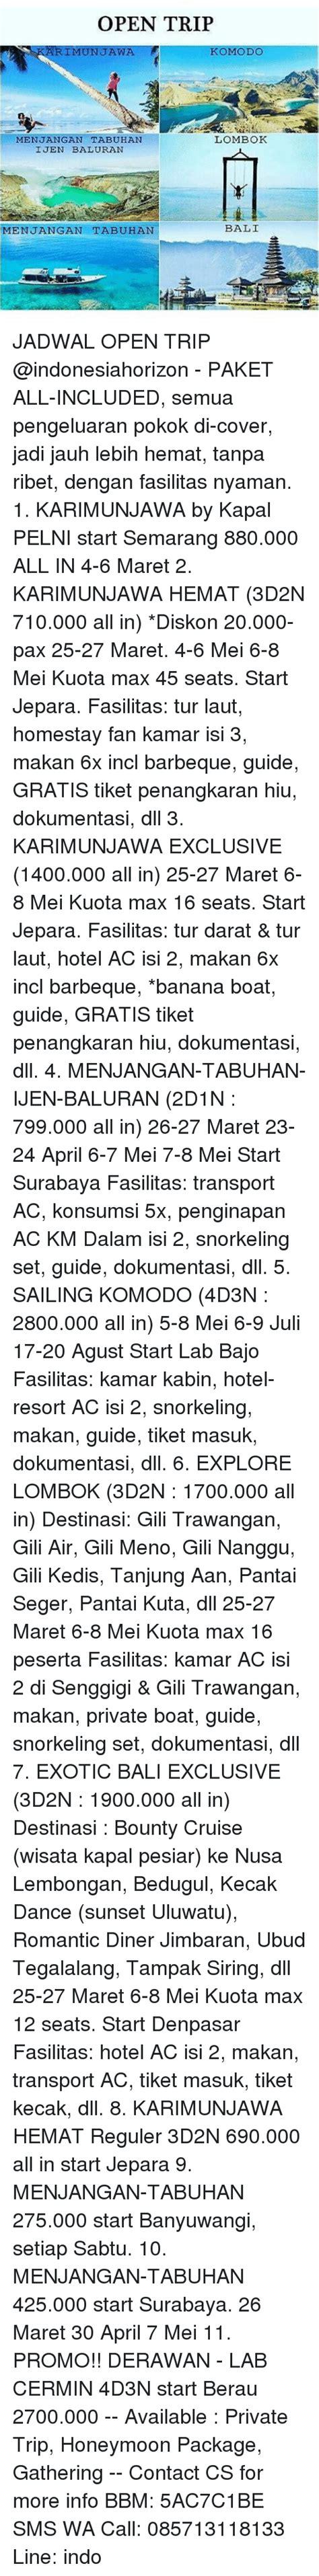 Paket Wisata Sailing Komodo Kamar Kabin 4d3n Boat Memes Of 2016 On Sizzle